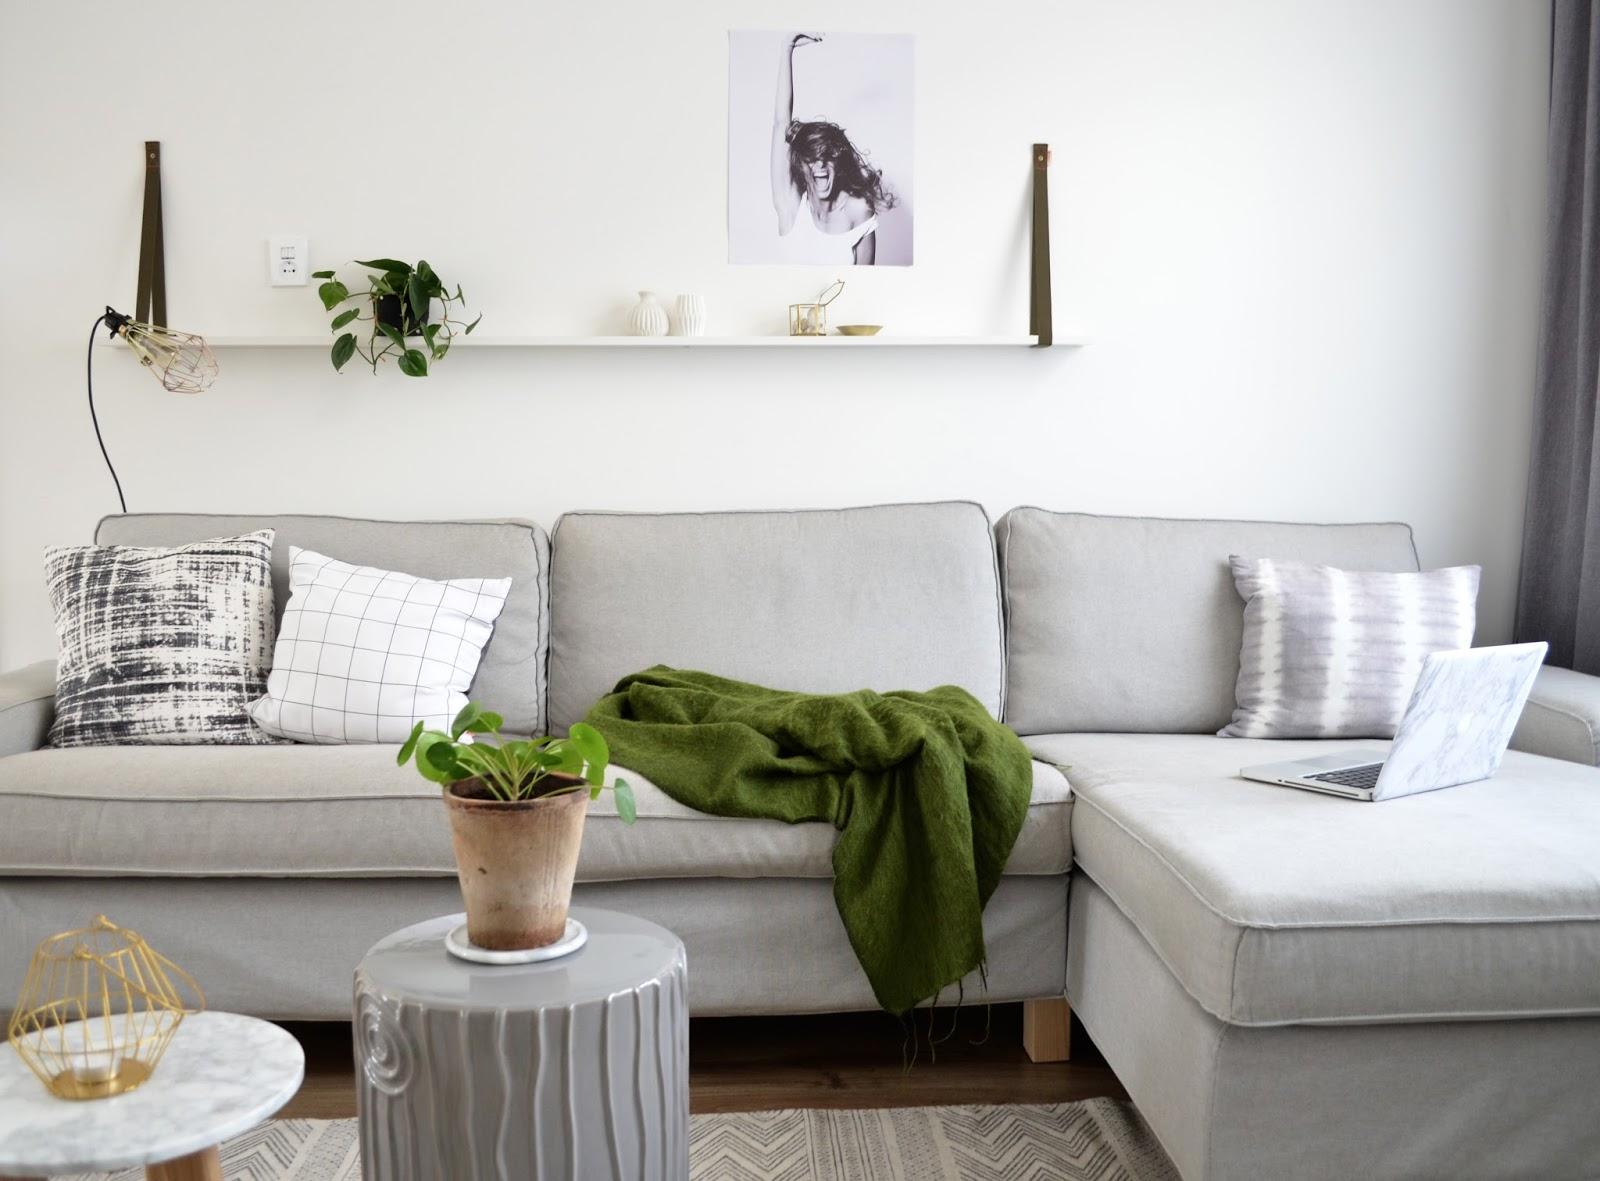 Ikea Woonkamer Hoekbanken : Ikea slaap hoekbank elegant category with ikea slaap hoekbank